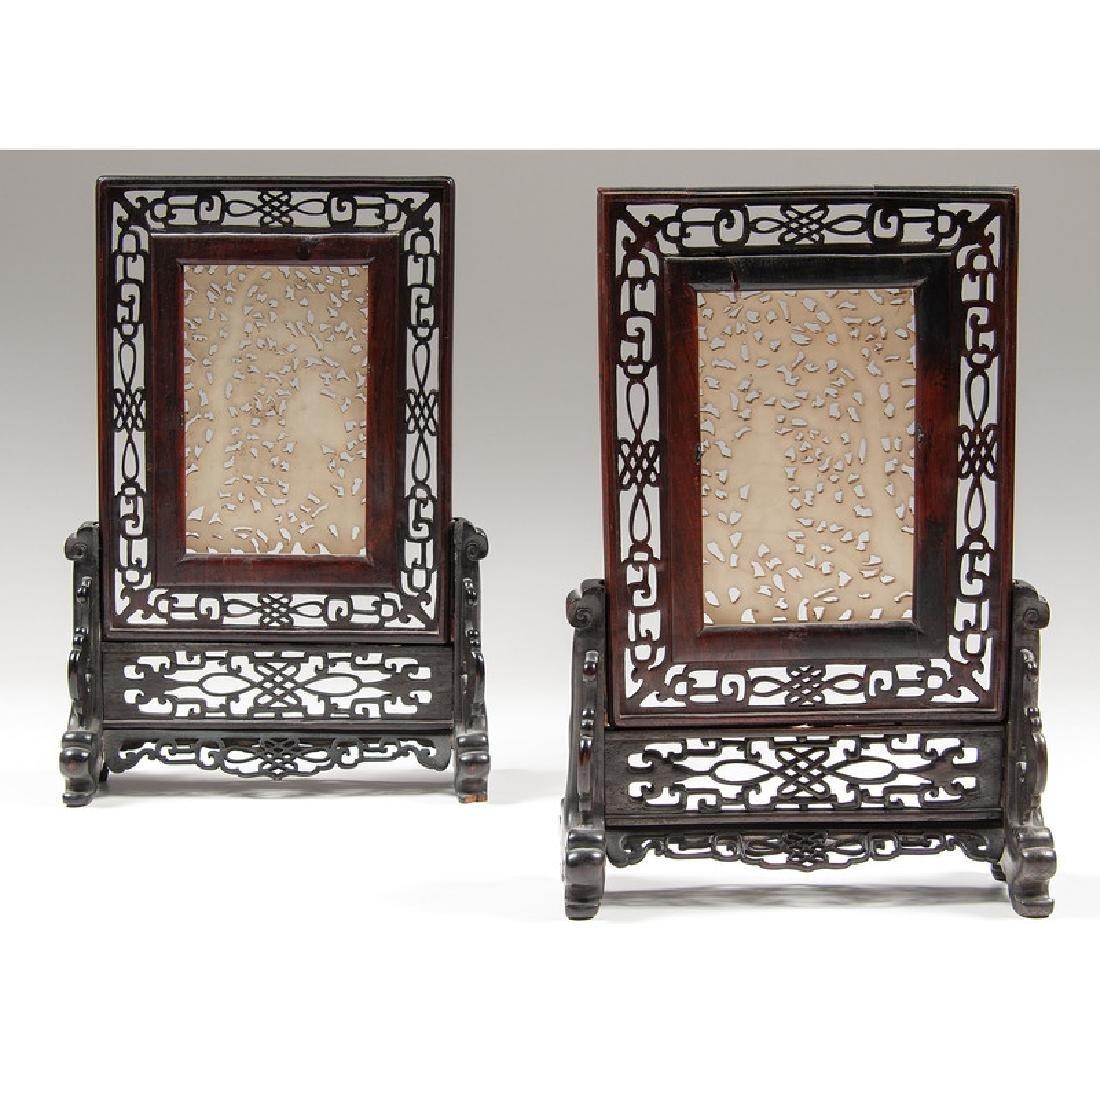 White Jade Table Screens - 2